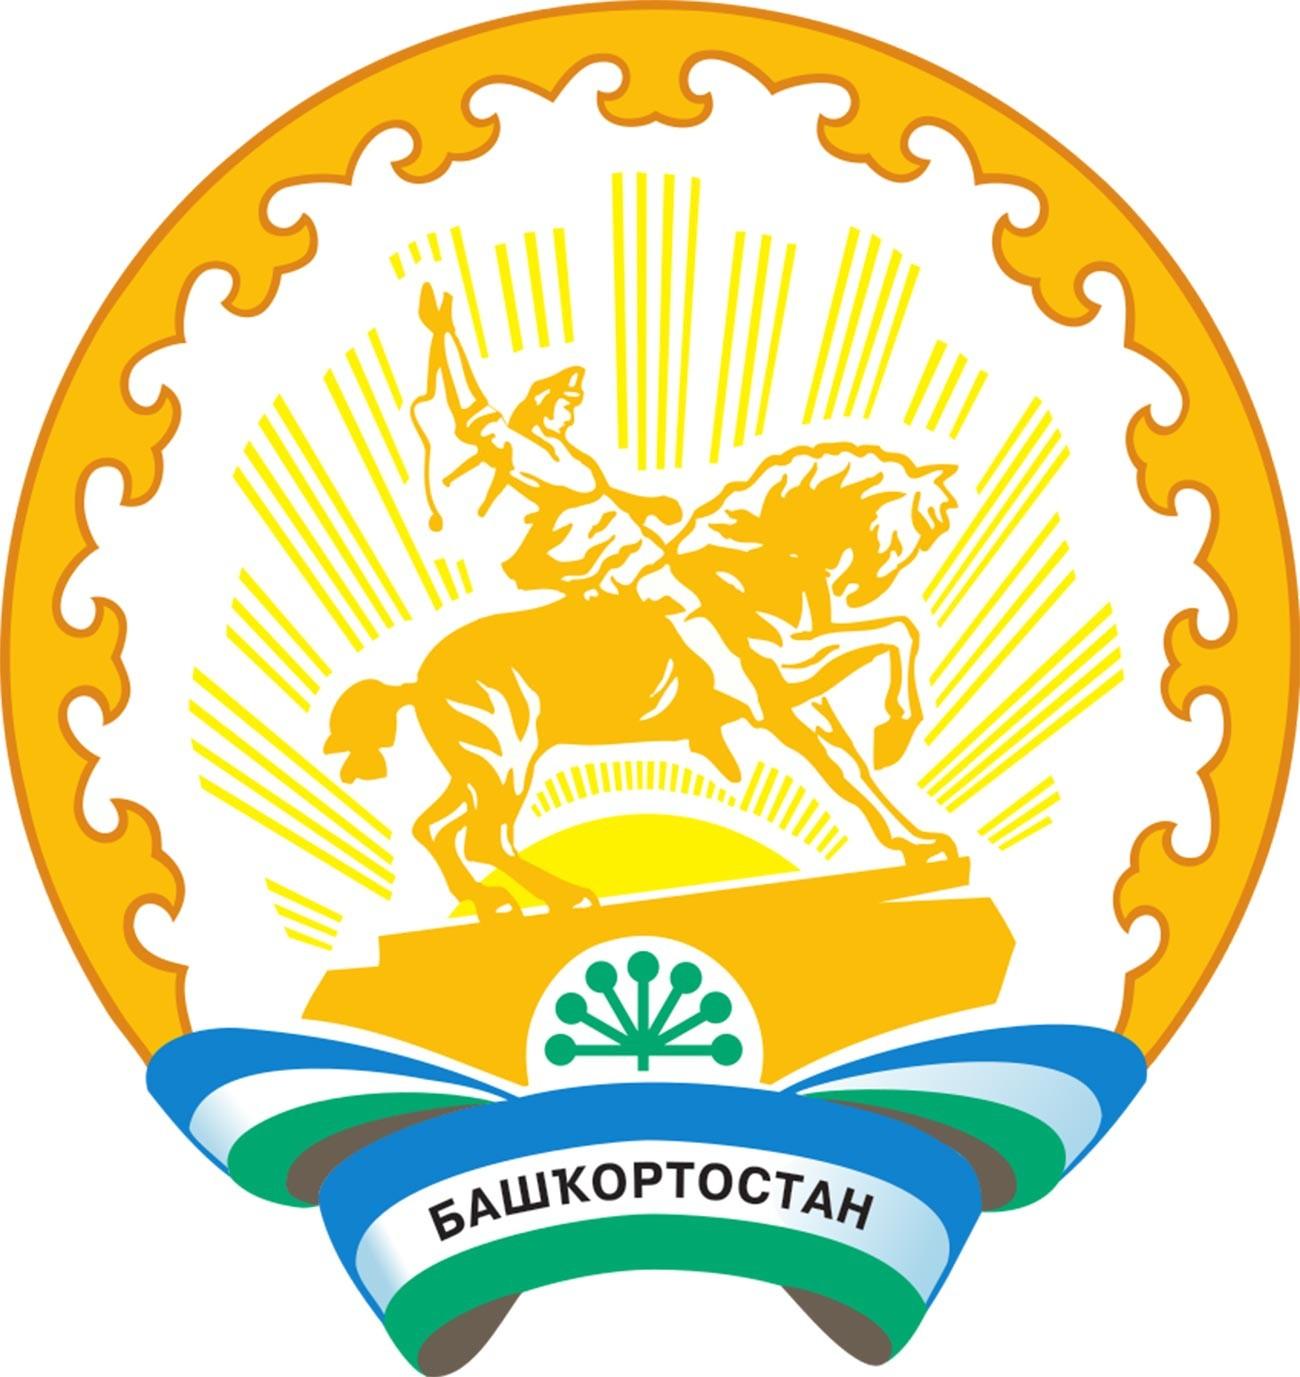 Emblème du Bachkortostan